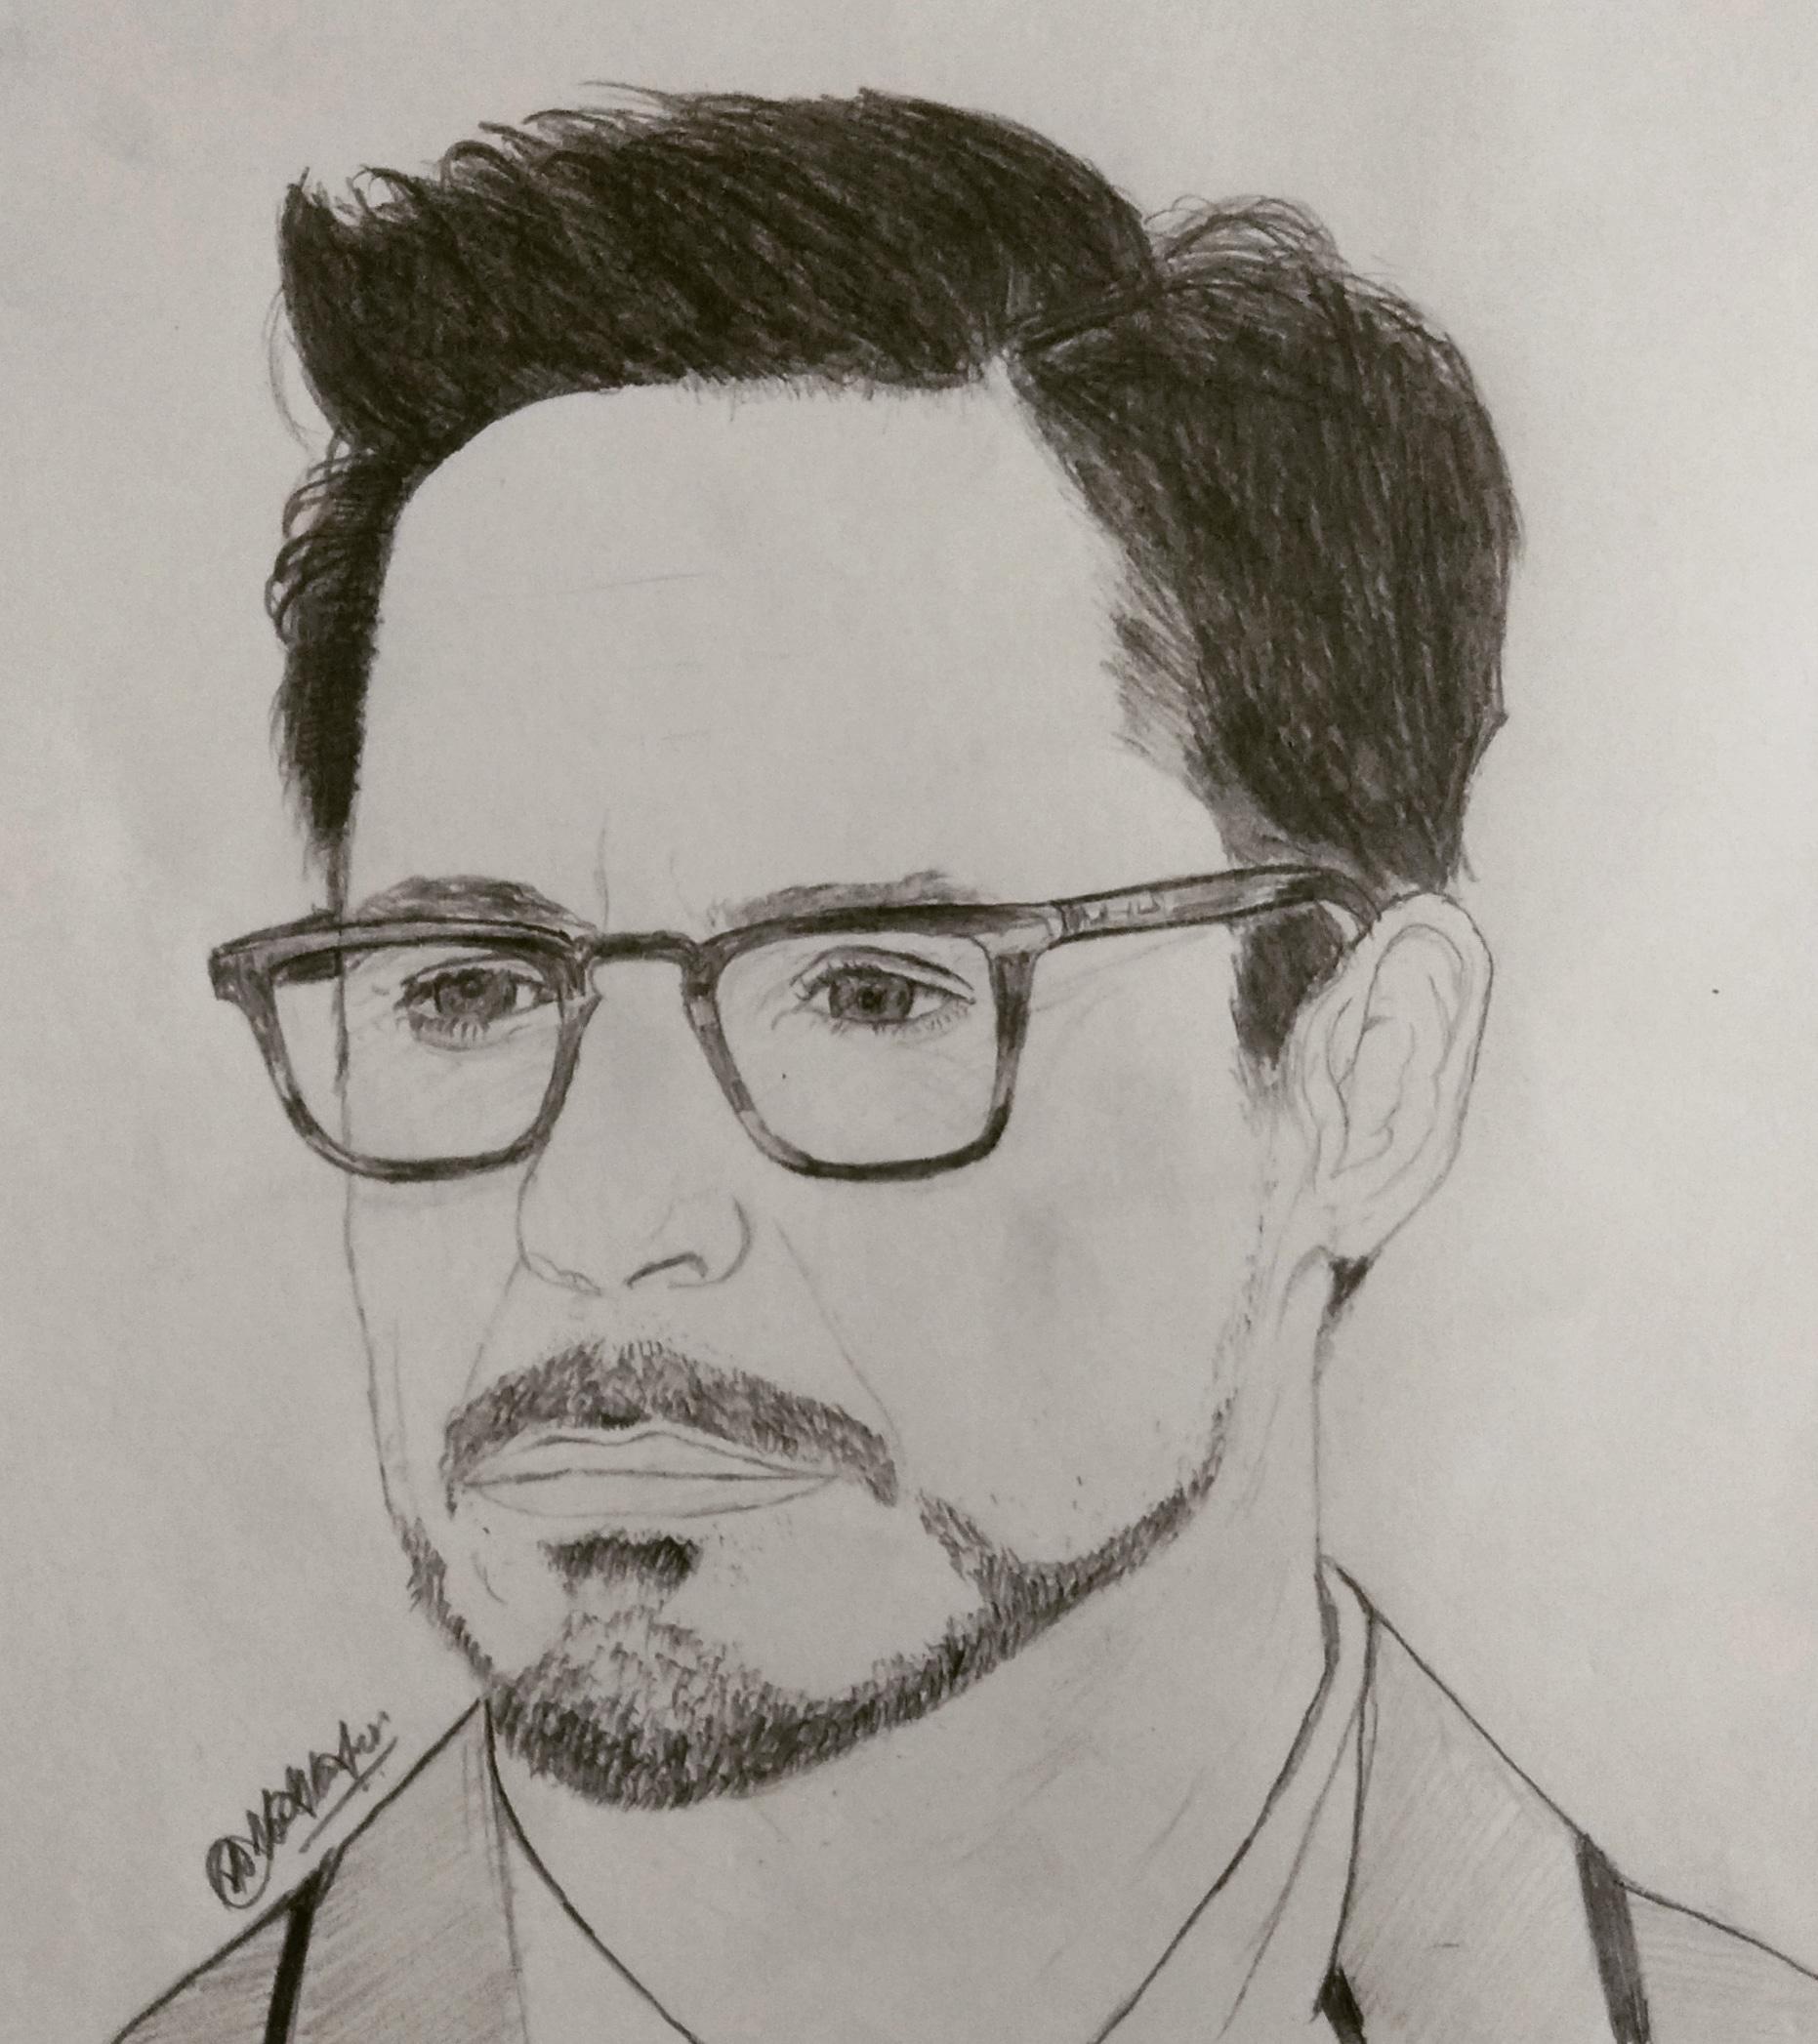 Robert Downey Jr Portrait Pencil Sketch- Showflipper